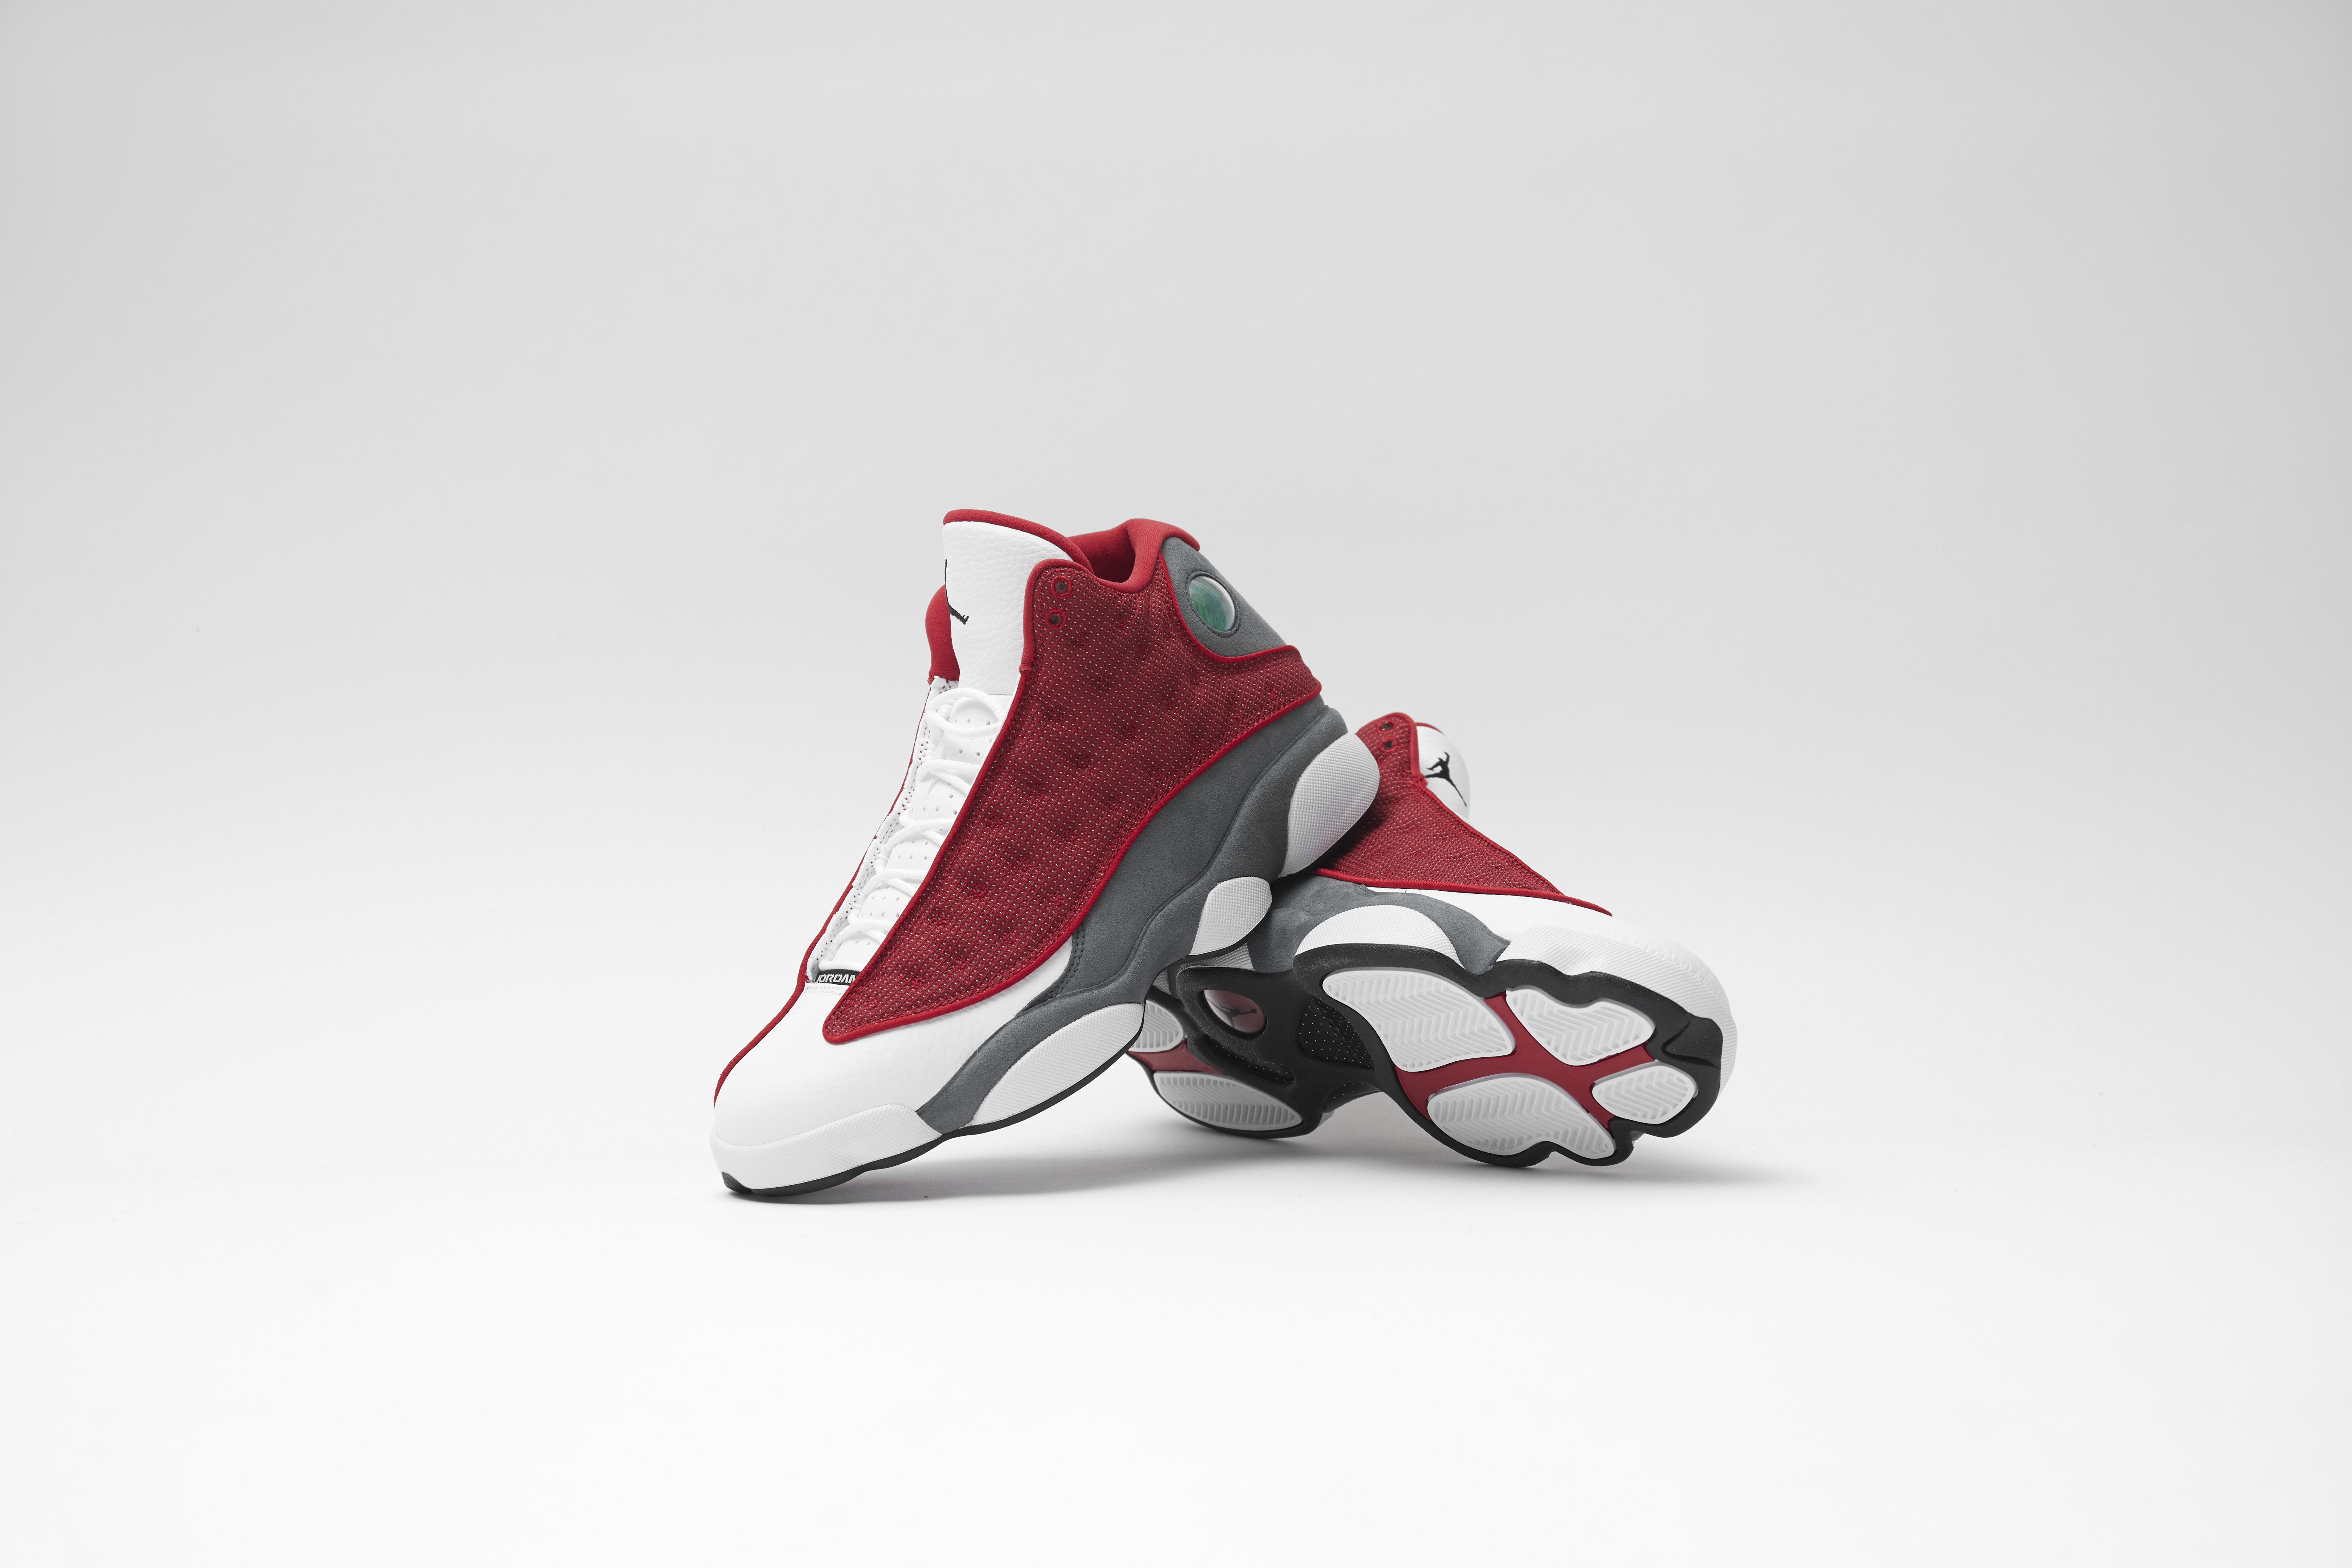 Take a look at the Air Jordan Retro 13 'Red Flint'